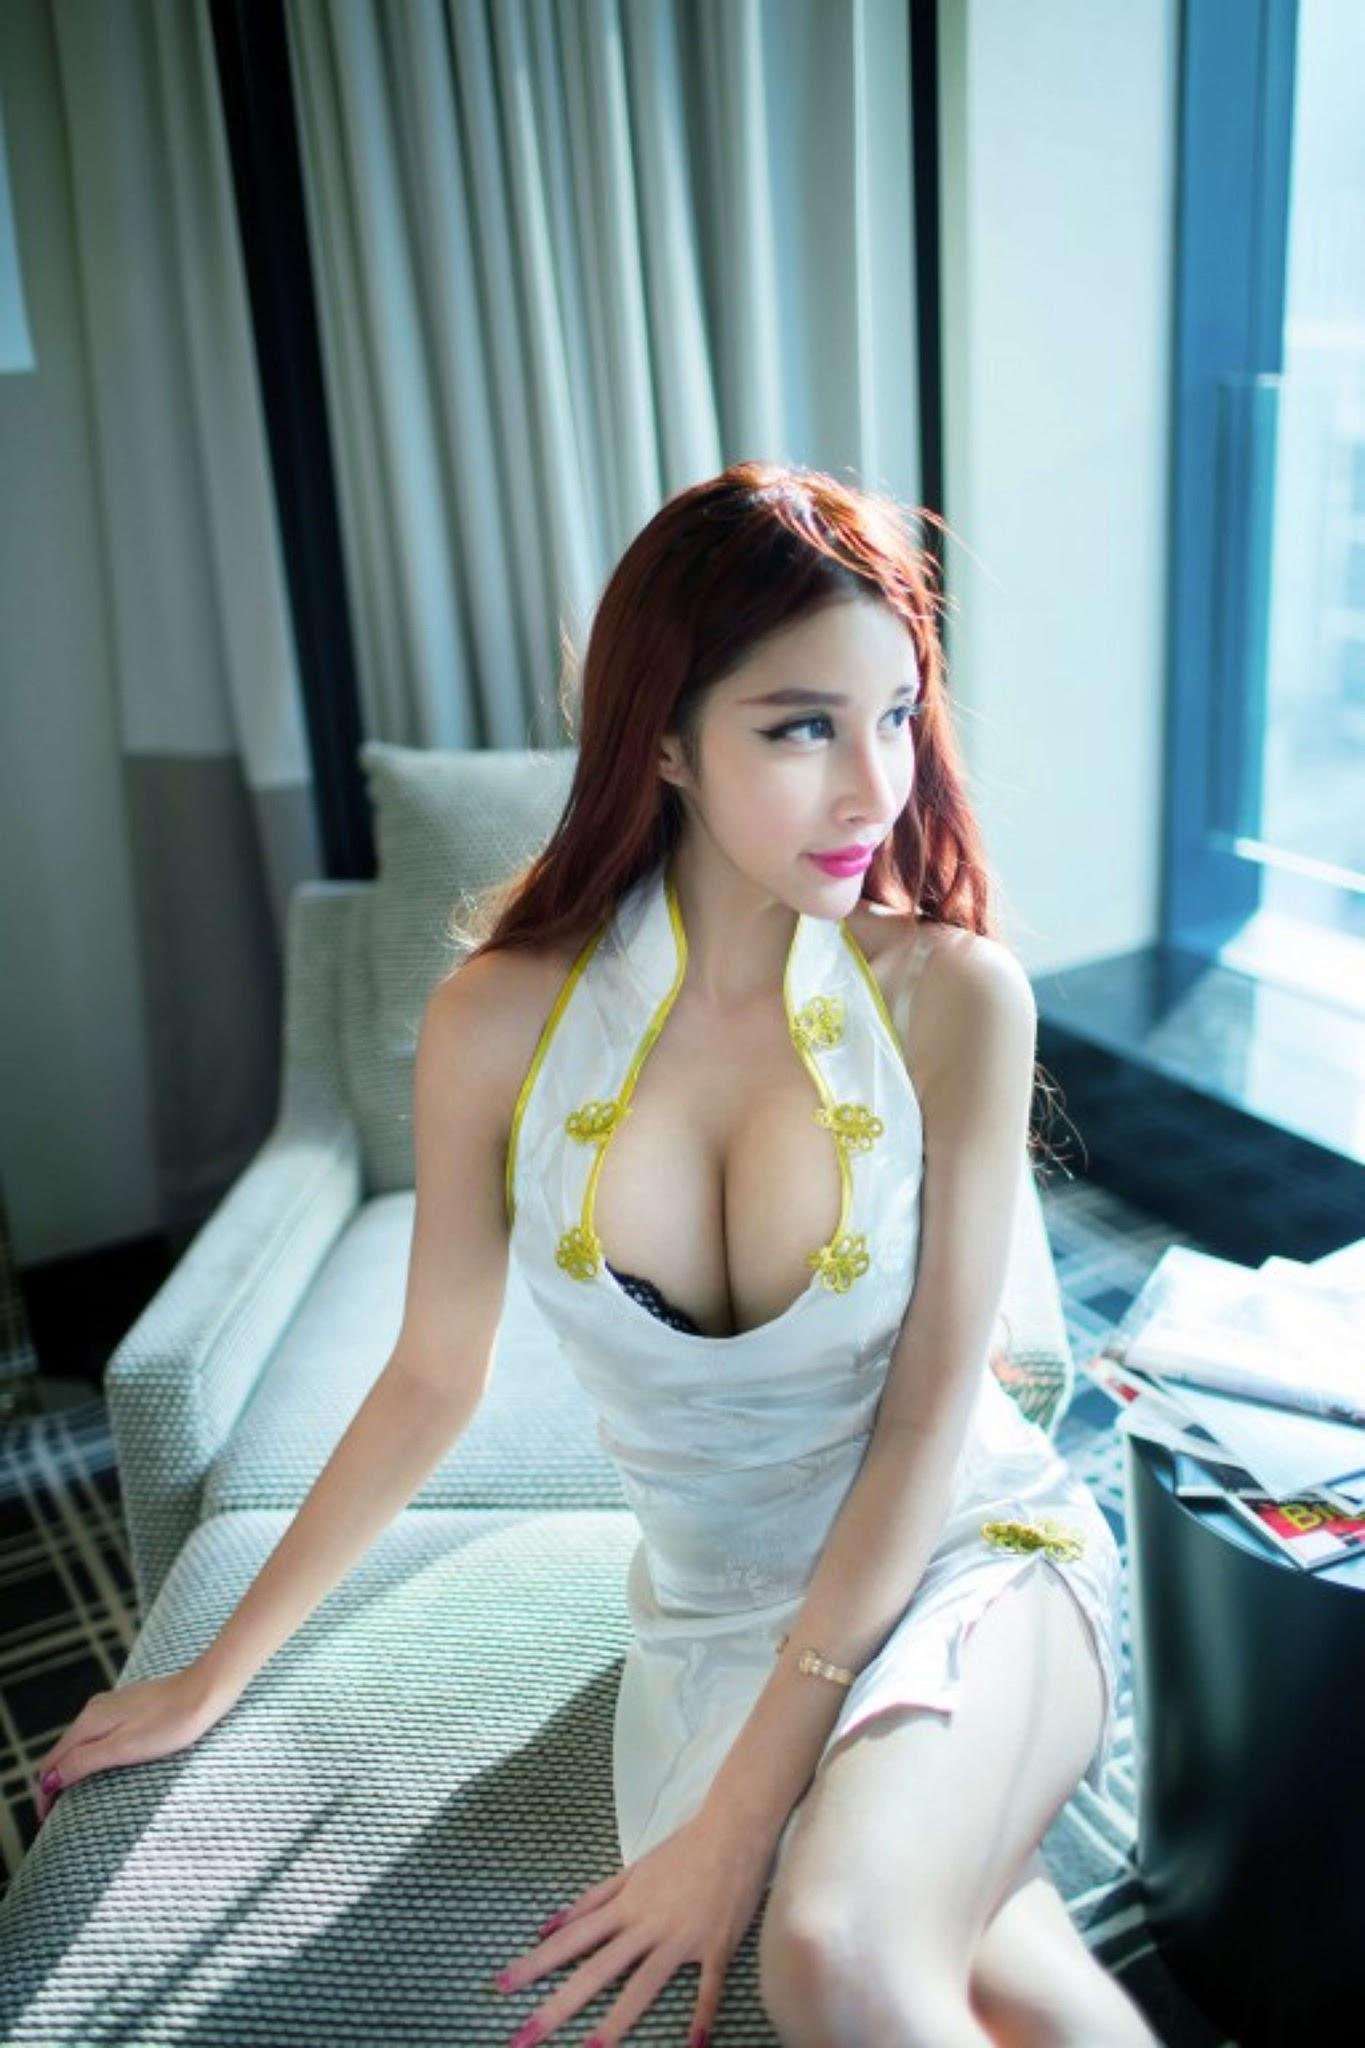 porn naked girls Chinese